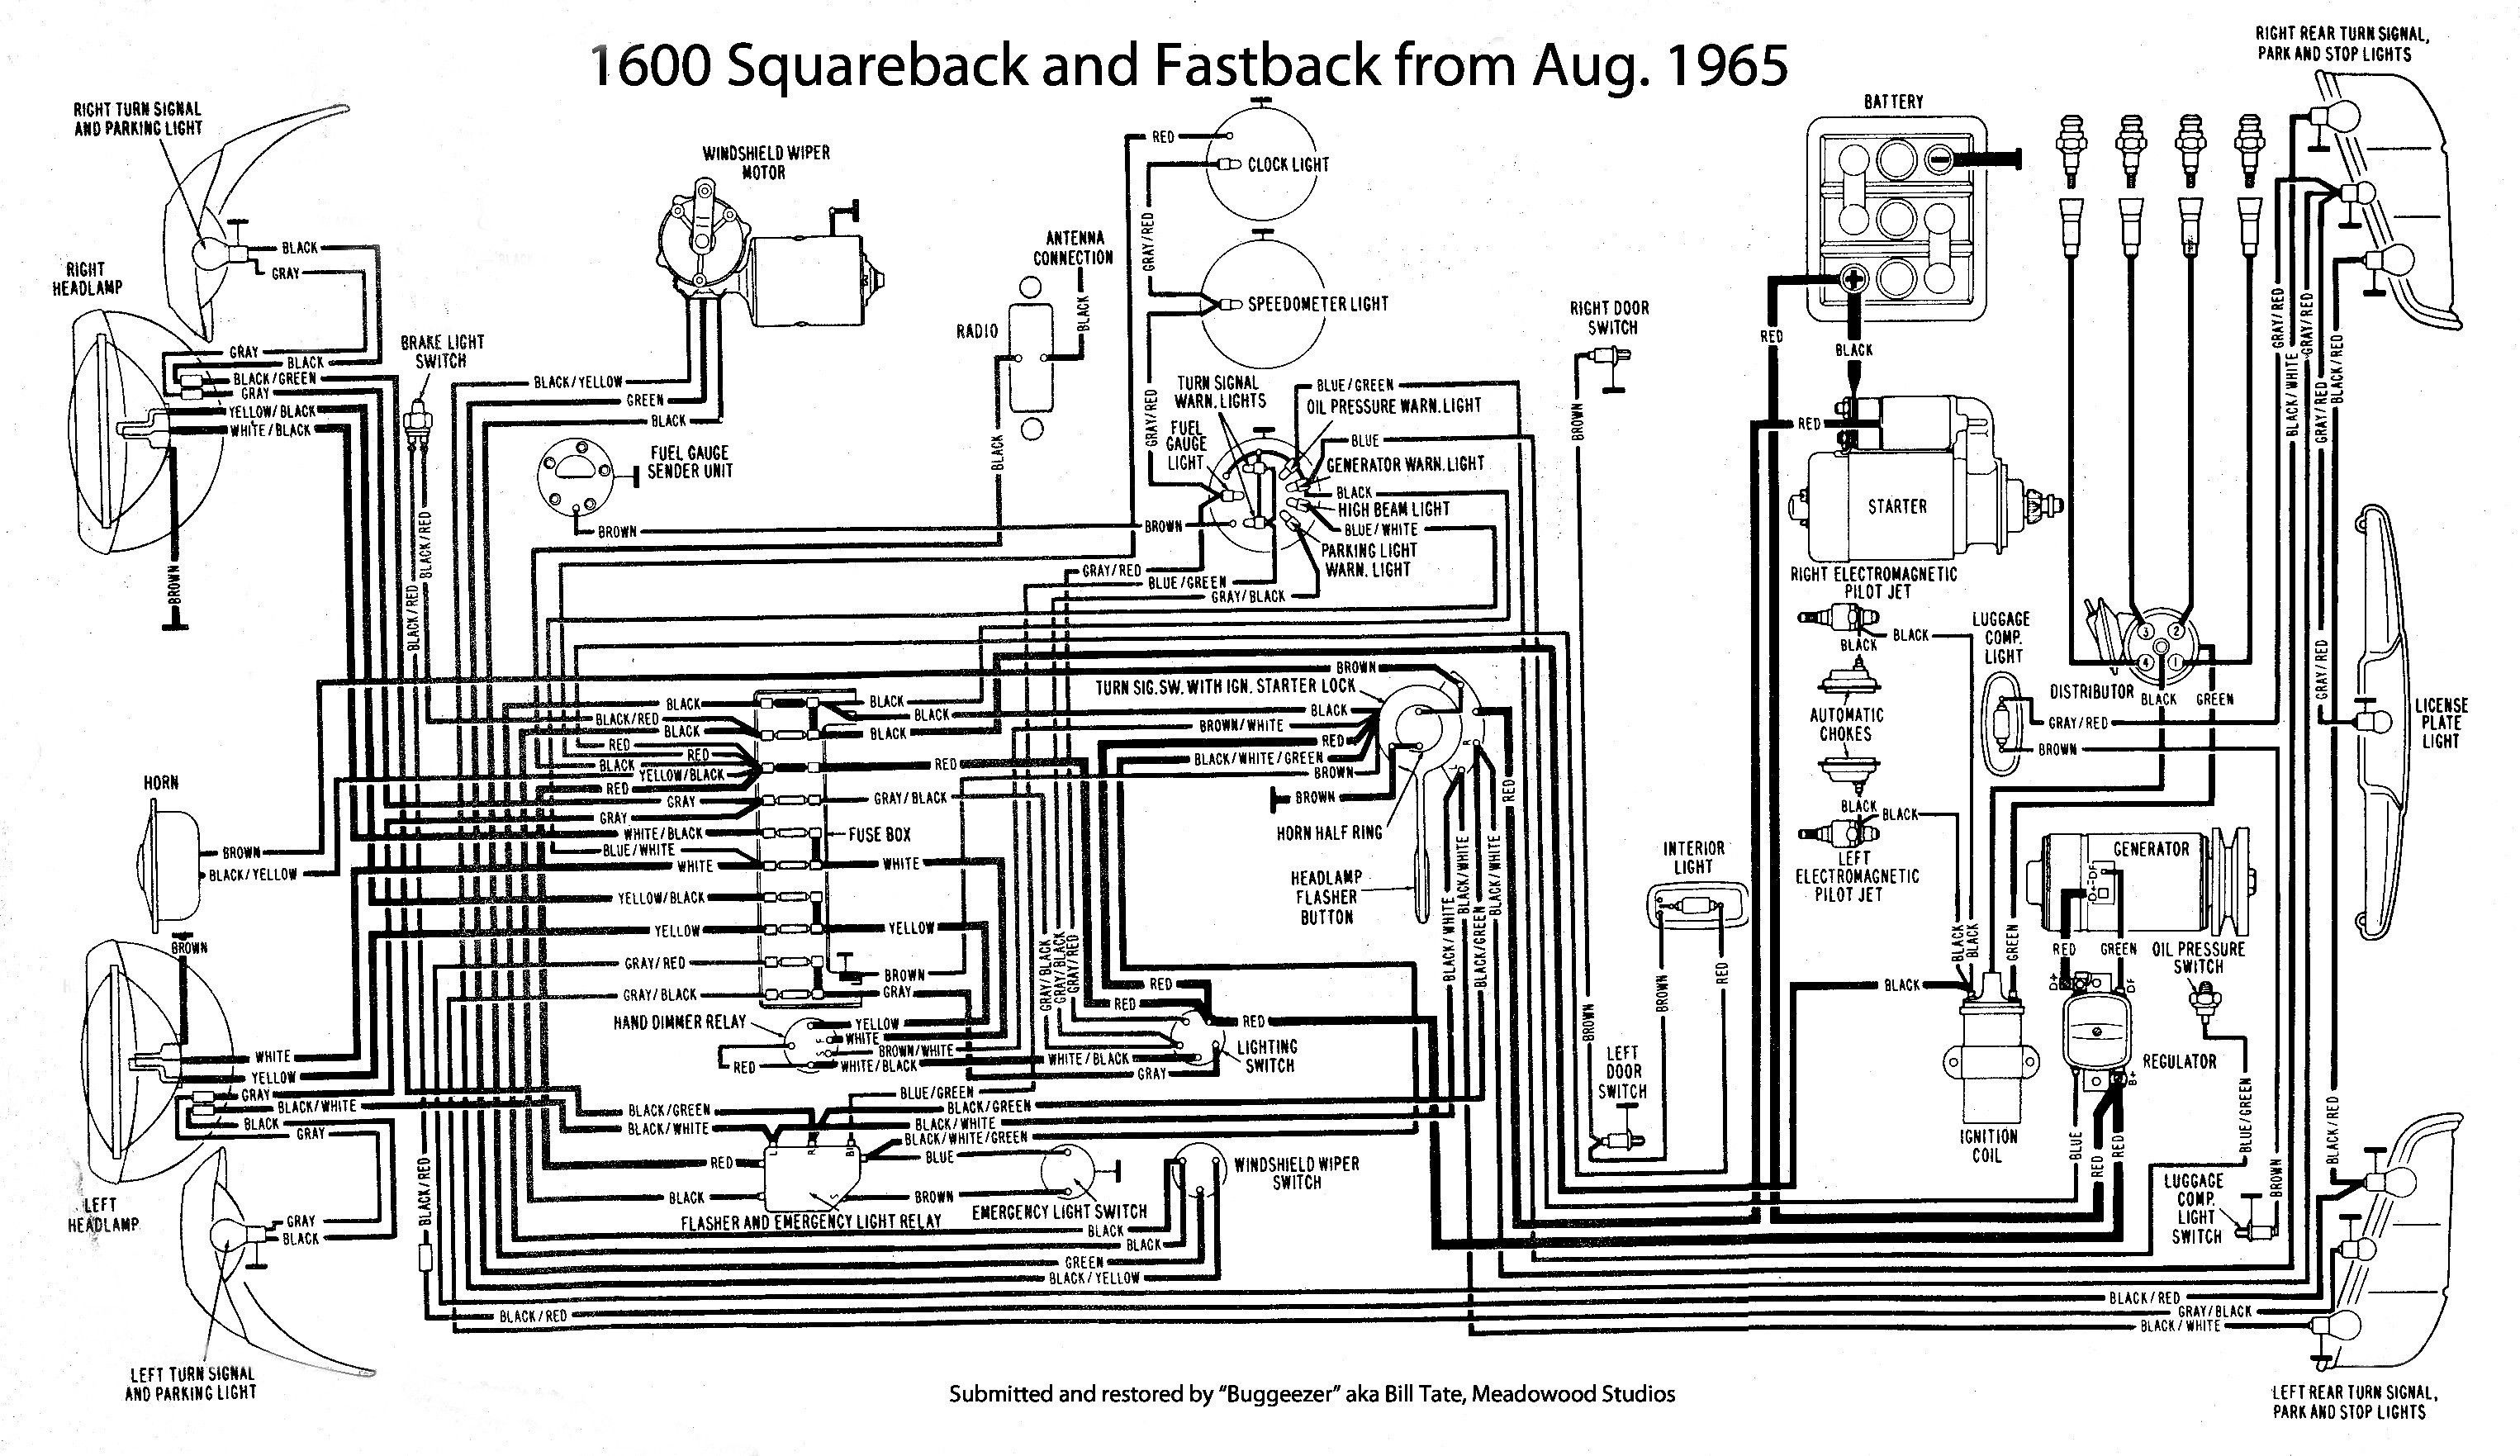 New Bmw E46 318i Ecu Wiring Diagram Bmw E46 Diagram Electrical Wiring Diagram